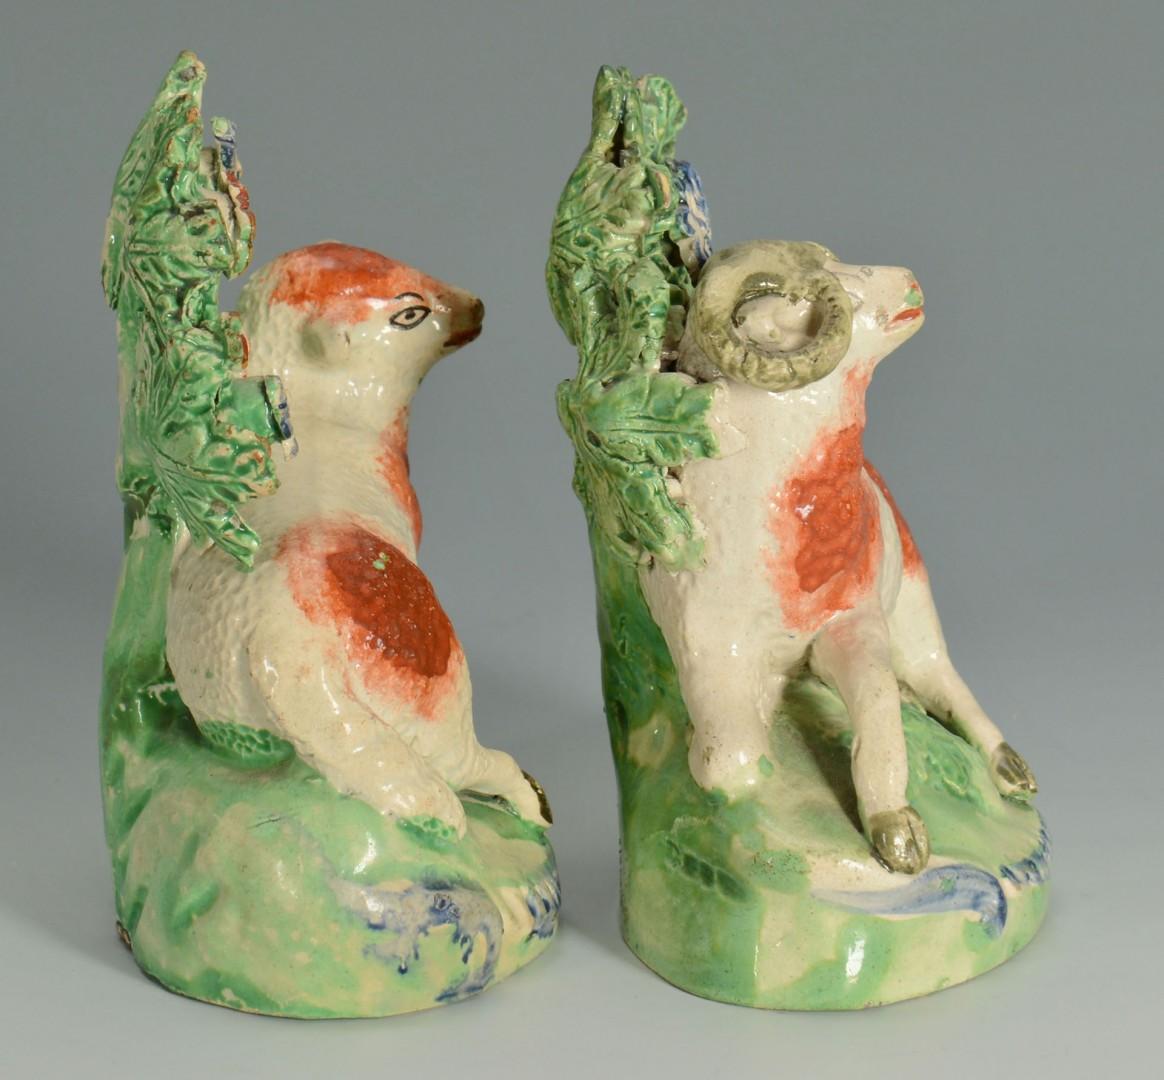 Staffordshire Ewe and Ram